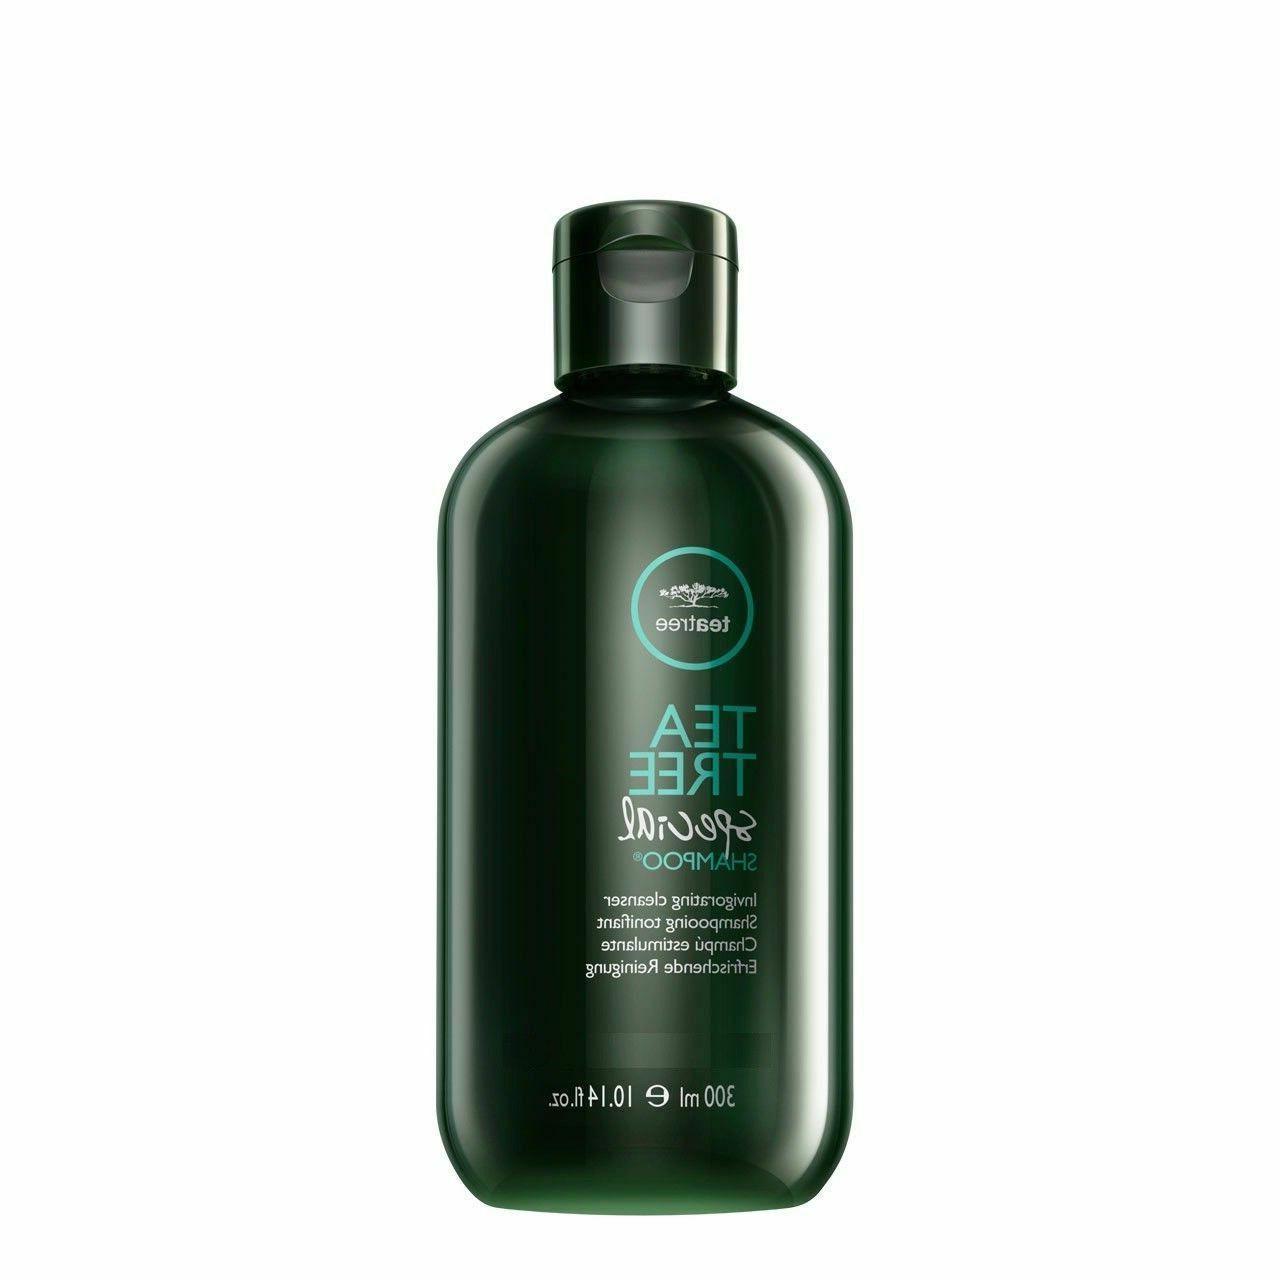 Paul Special Shampoo 16.9, 33.8 Liter